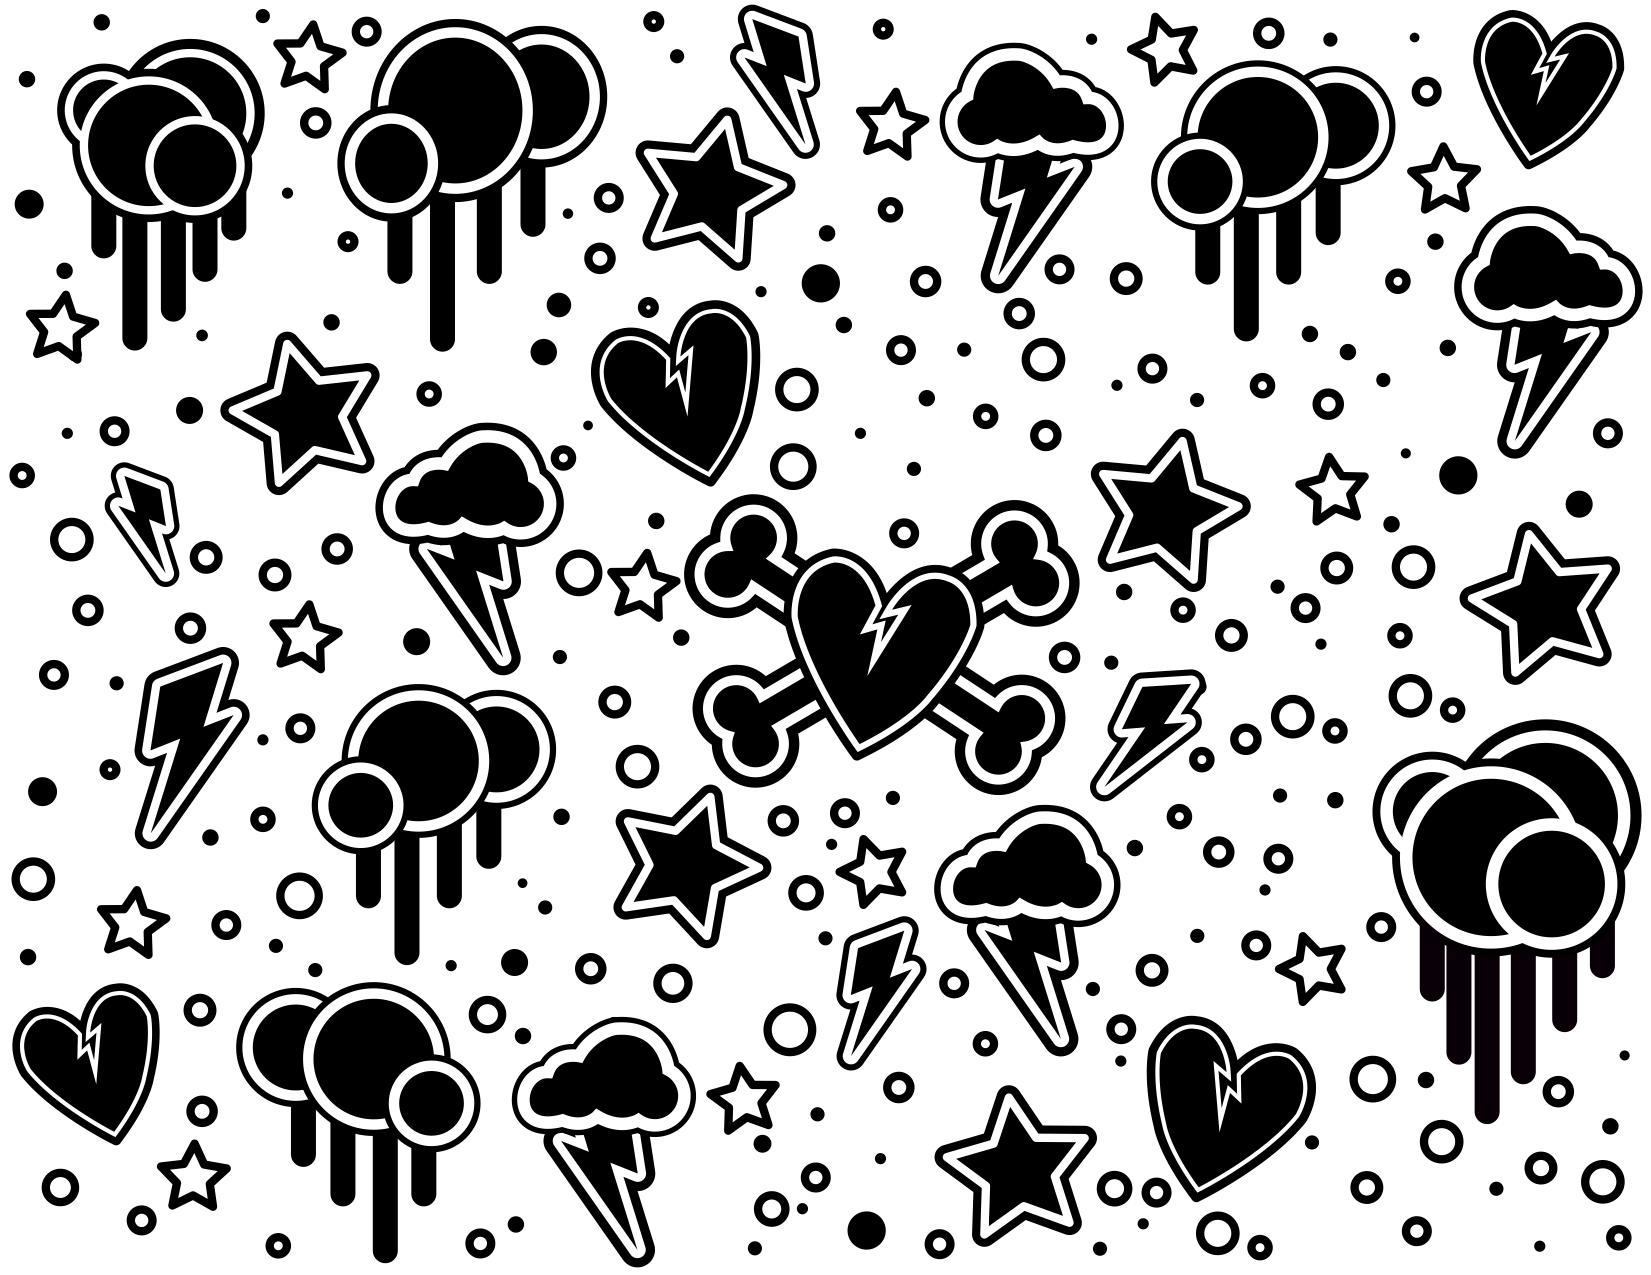 Pop Punk Design